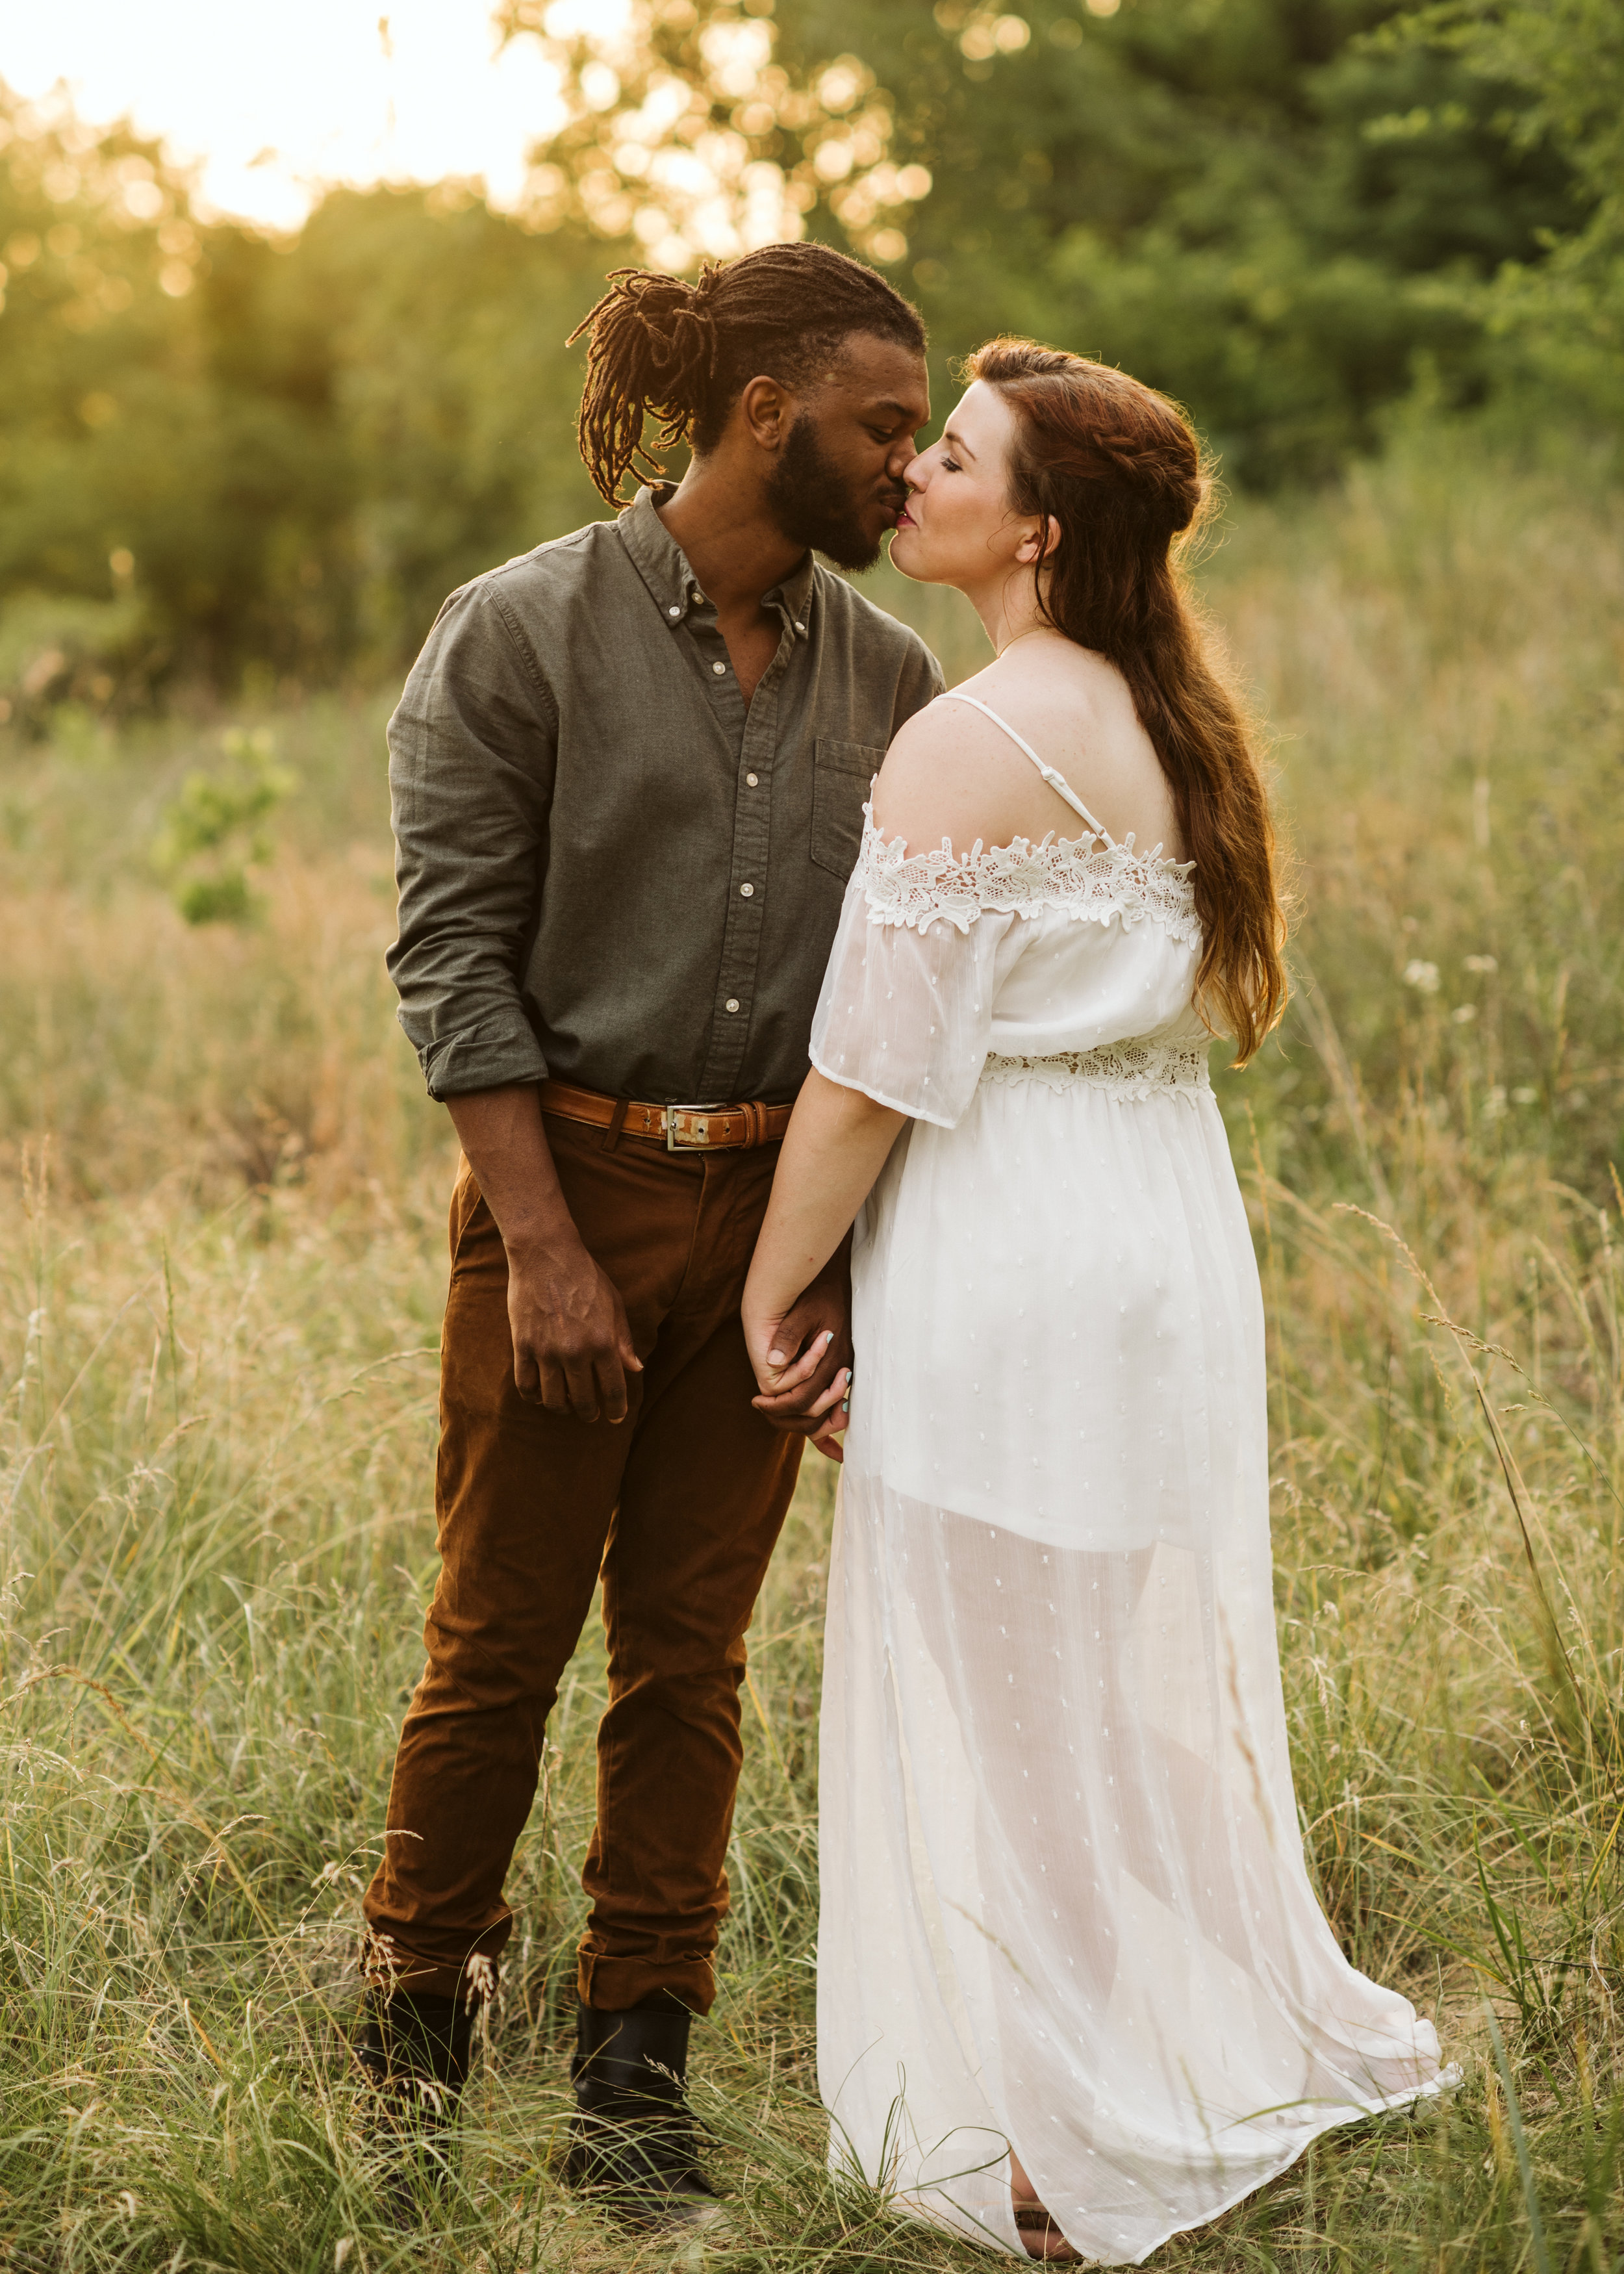 Emily & Sharaden Engagement Blog | Black Coffee Photo Co 02.jpg